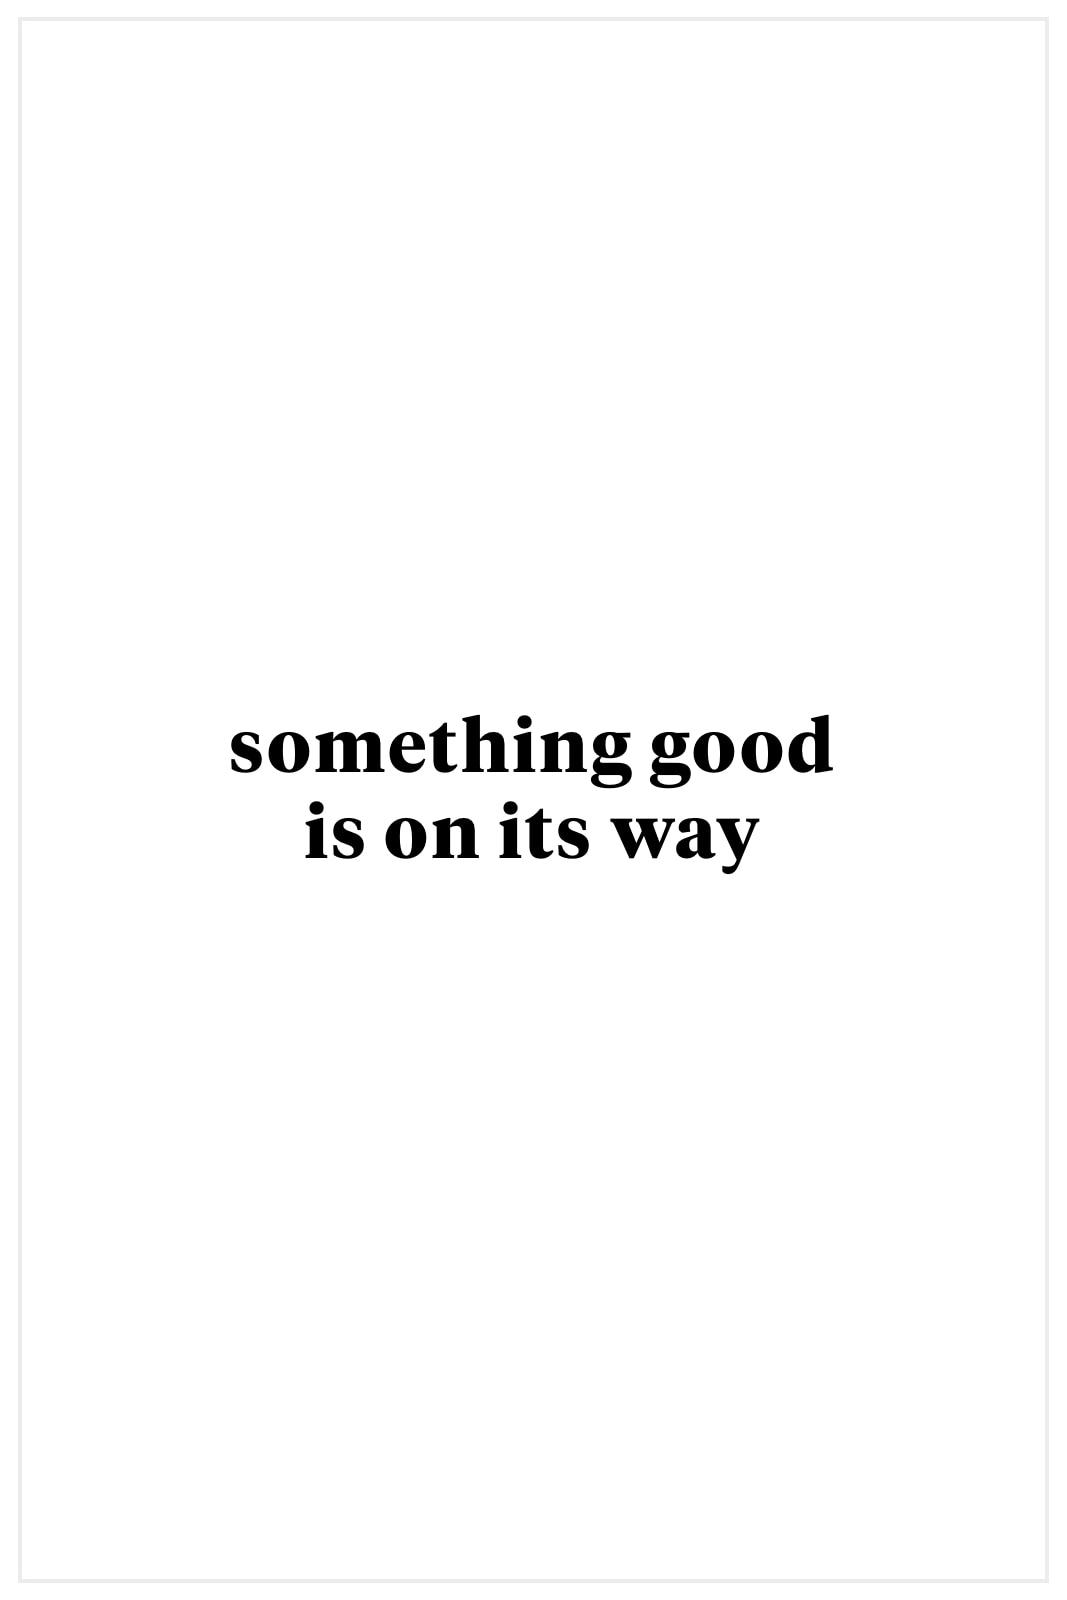 Huey Boot